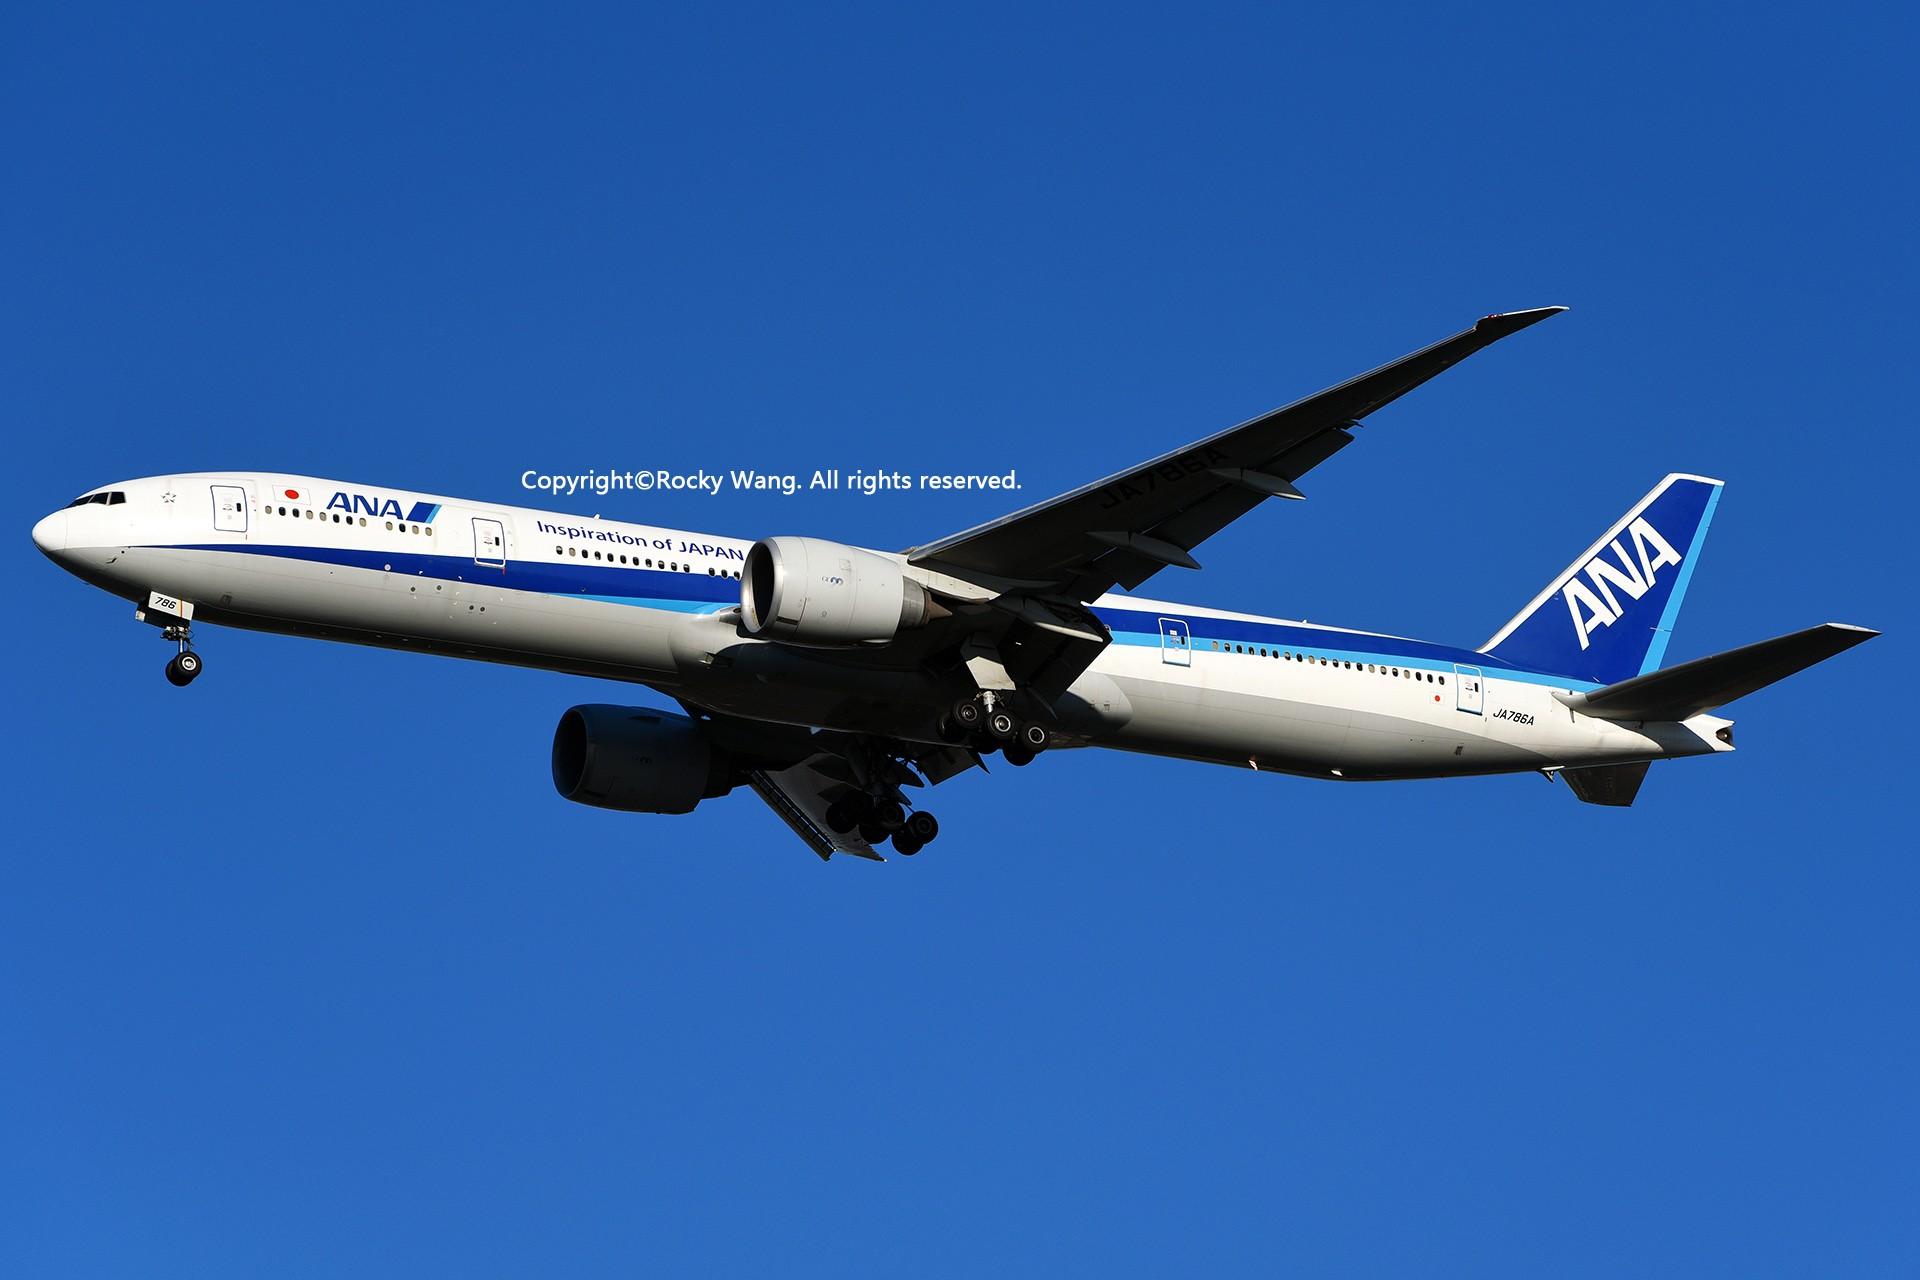 Re:[原创]KJFK 30图 BOEING 777-381ER JA786A New York John F. Kennedy Int'l Airport